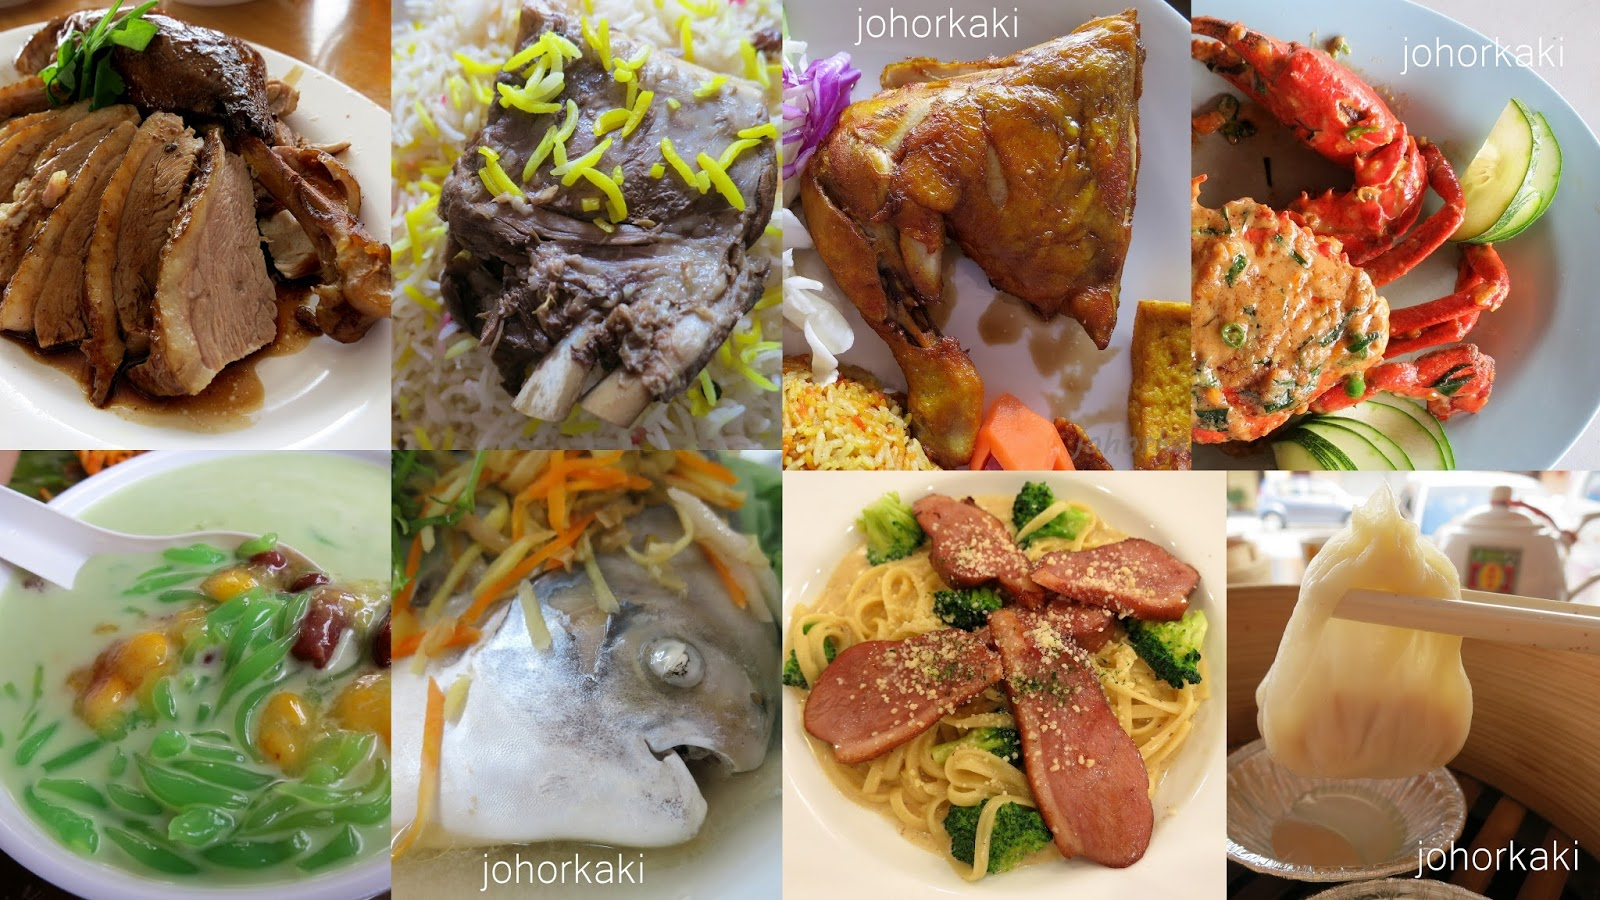 Johor kaki travels for food johor food paradise johor for Cuisine paradise